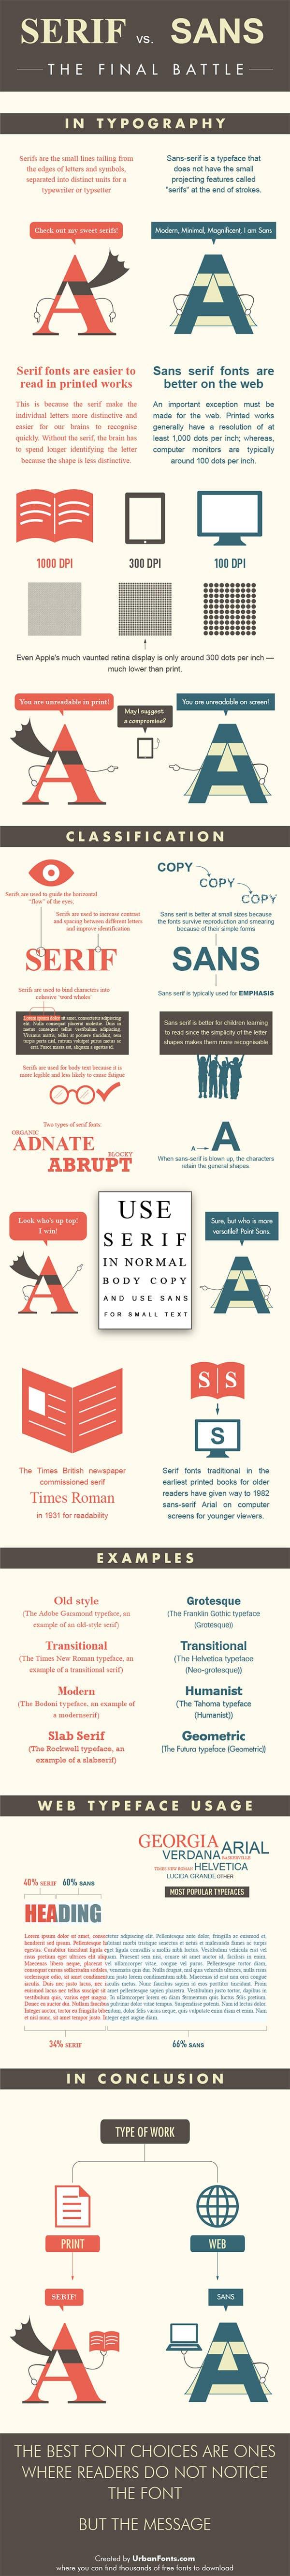 Serif vs. Sans Serif infographic